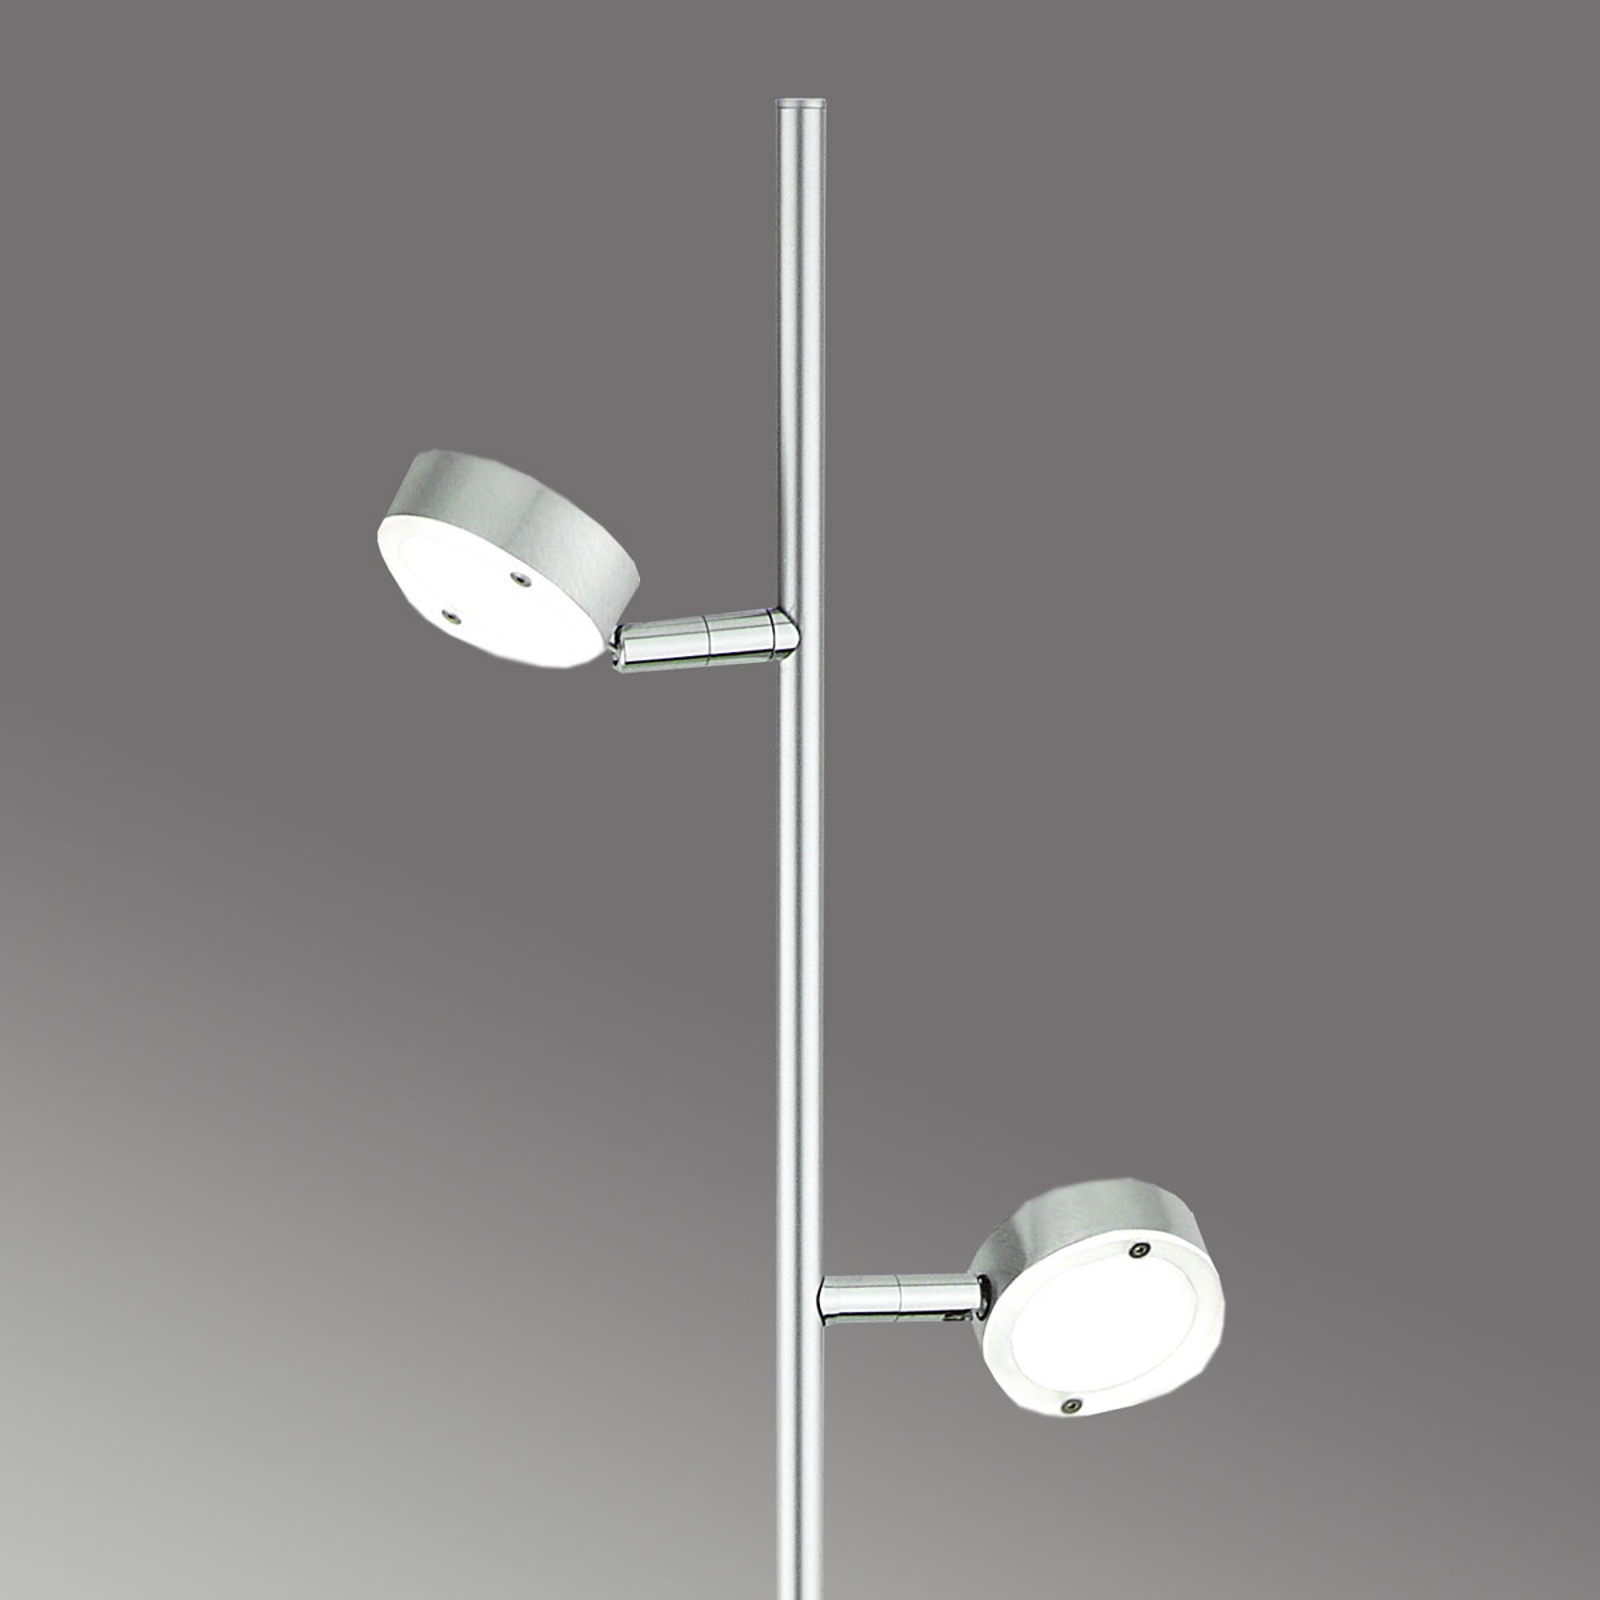 Lampada LED da terra SATURN, 2 luci